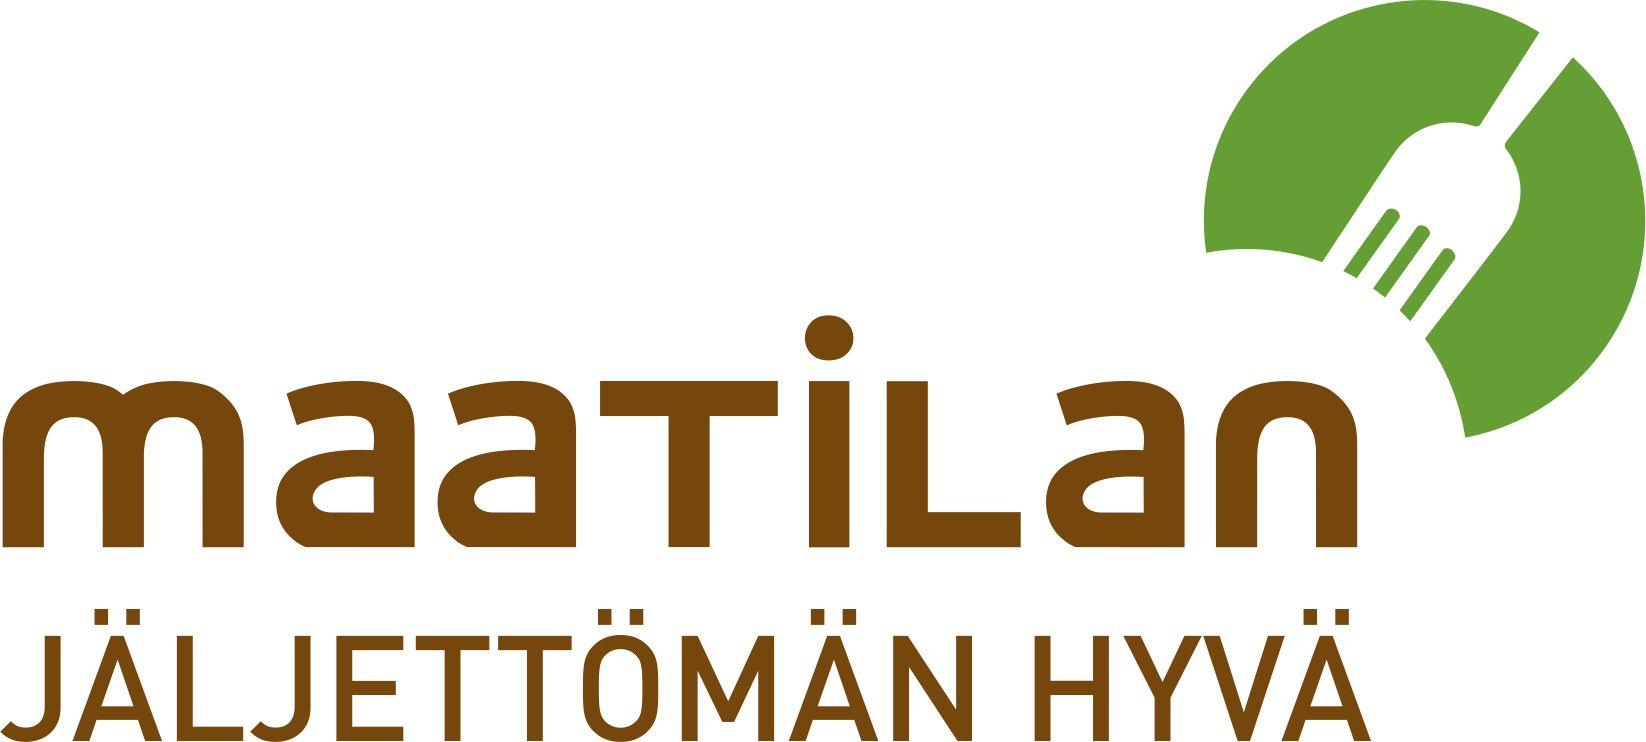 Potwell logo